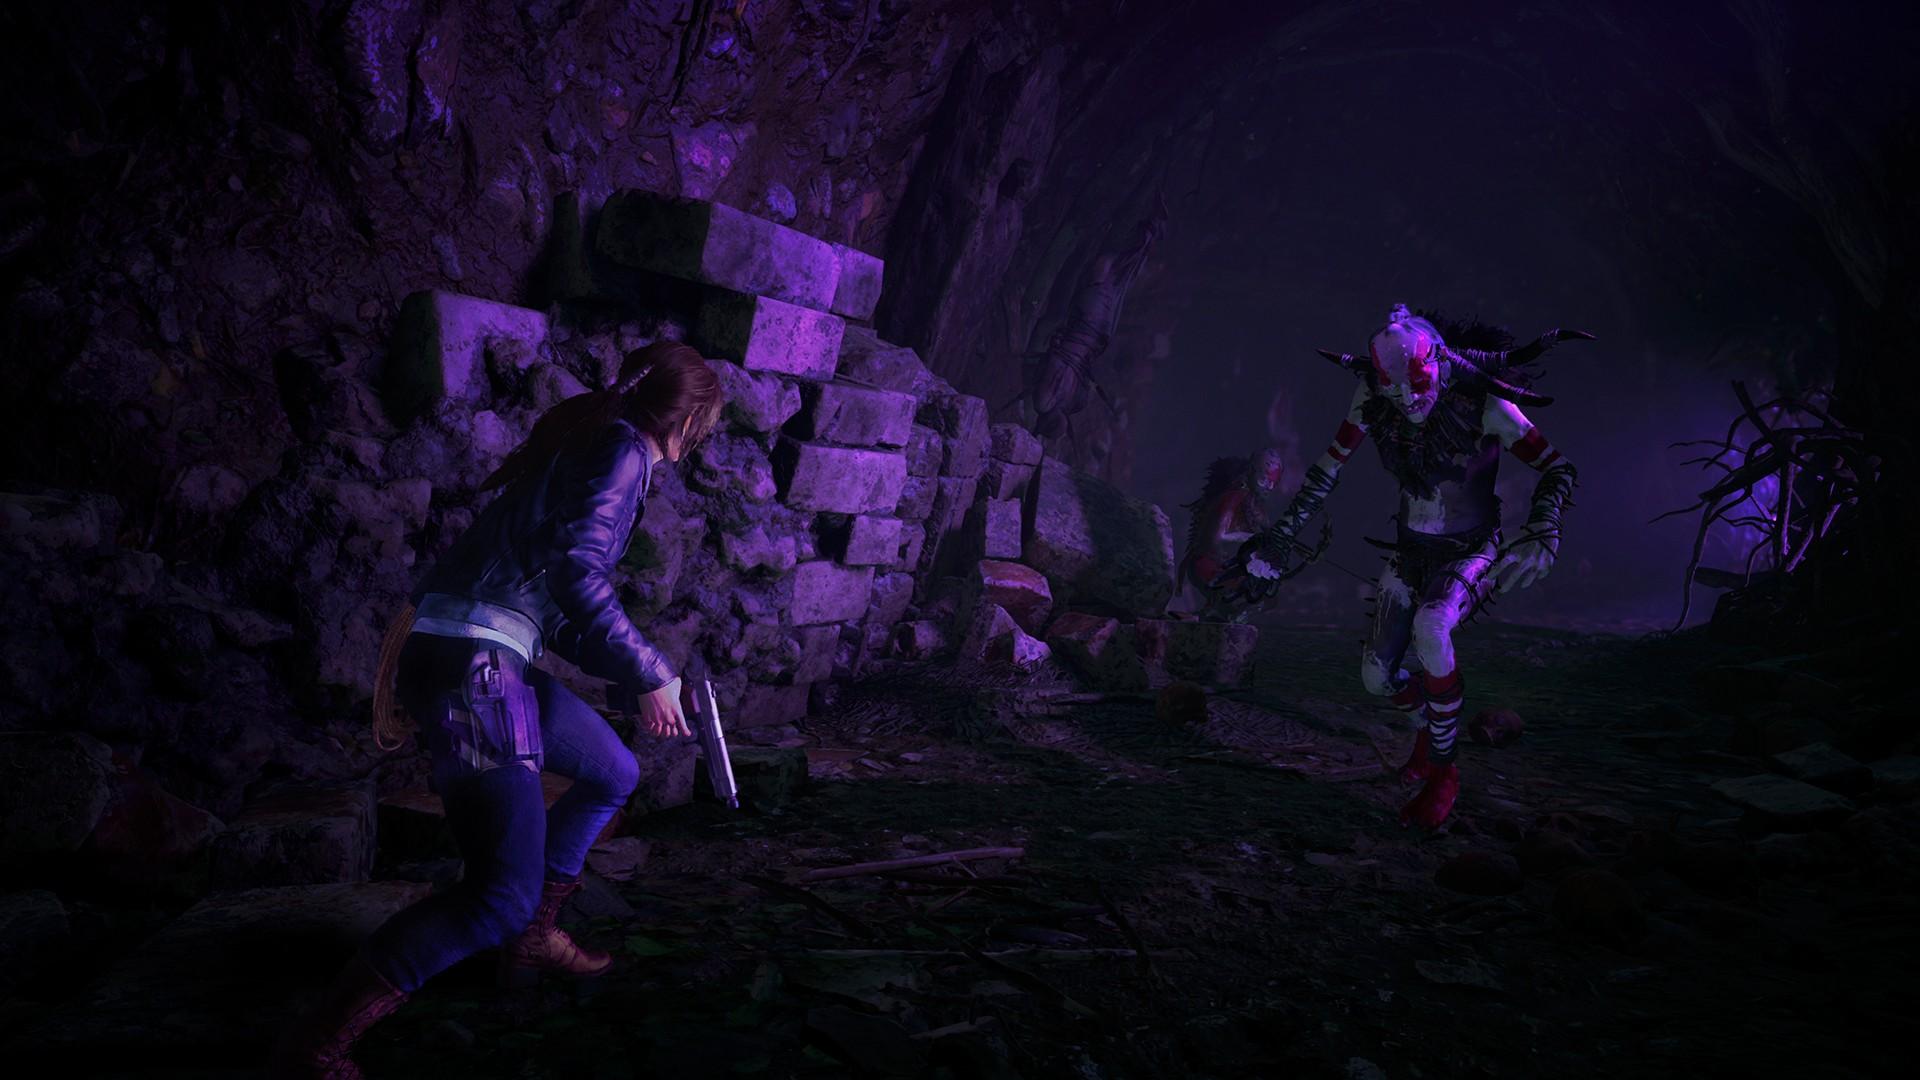 KHAiHOM.com - Shadow of the Tomb Raider - The Nightmare